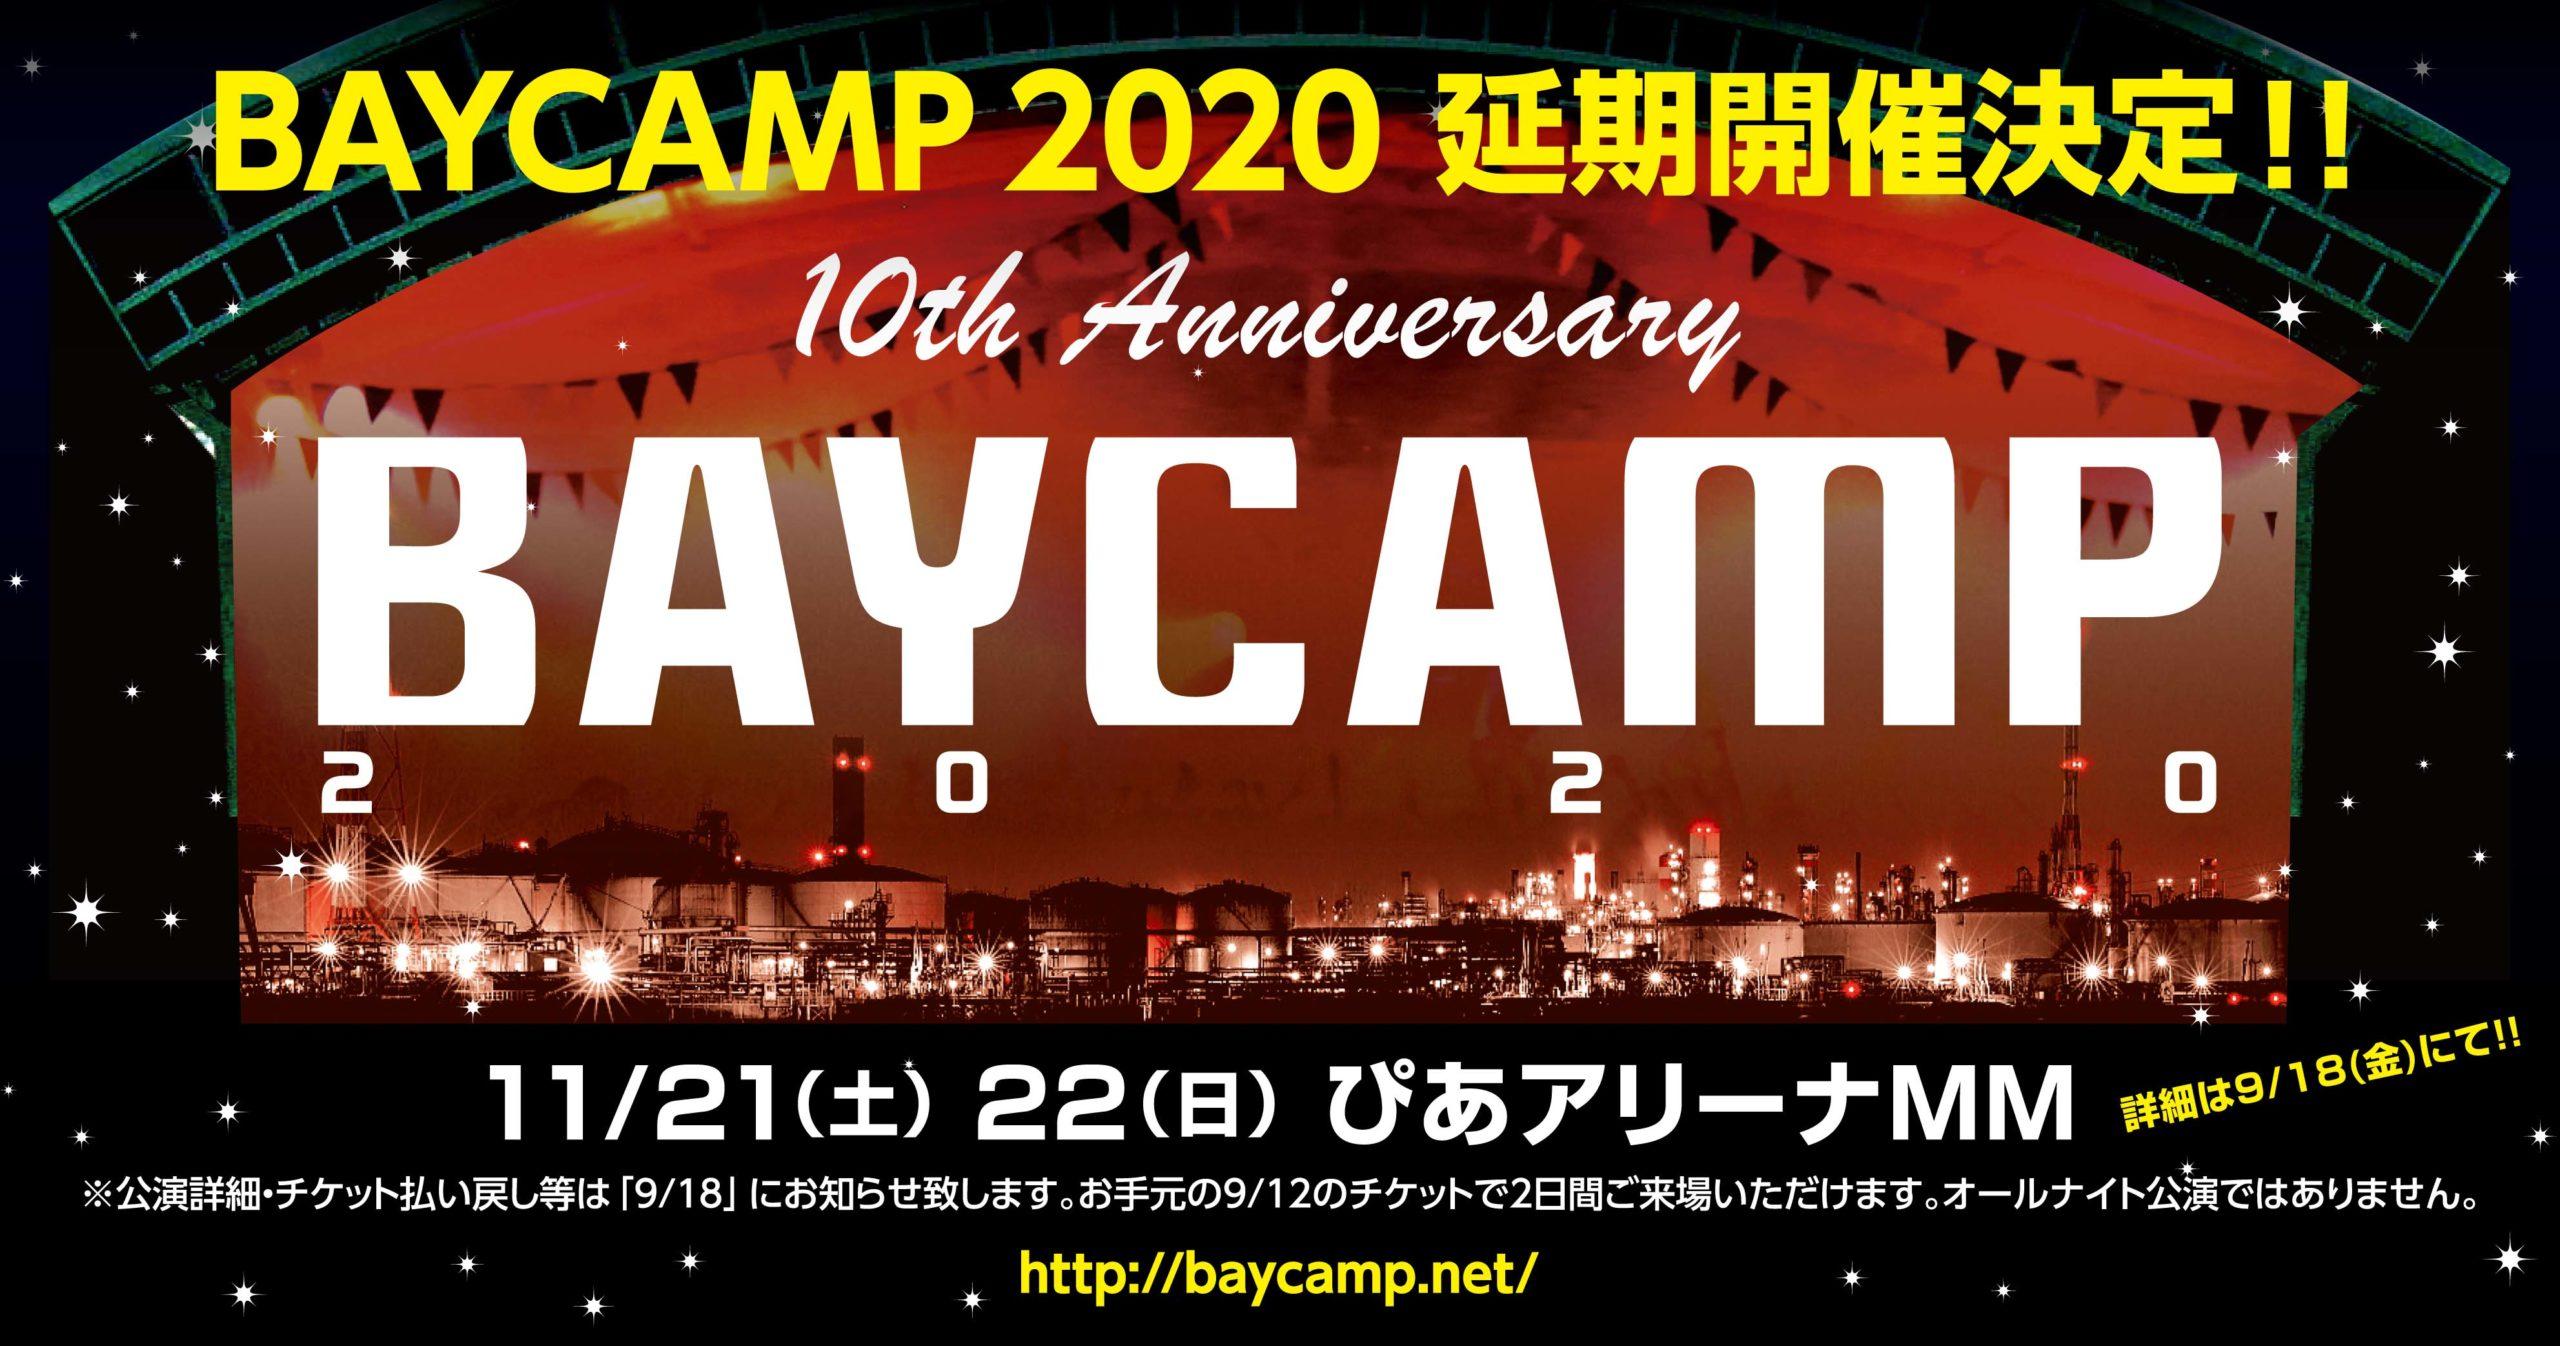 〈BAYCAMP 2020〉延期公演、11月にぴあアリーナMMにて2日間開催